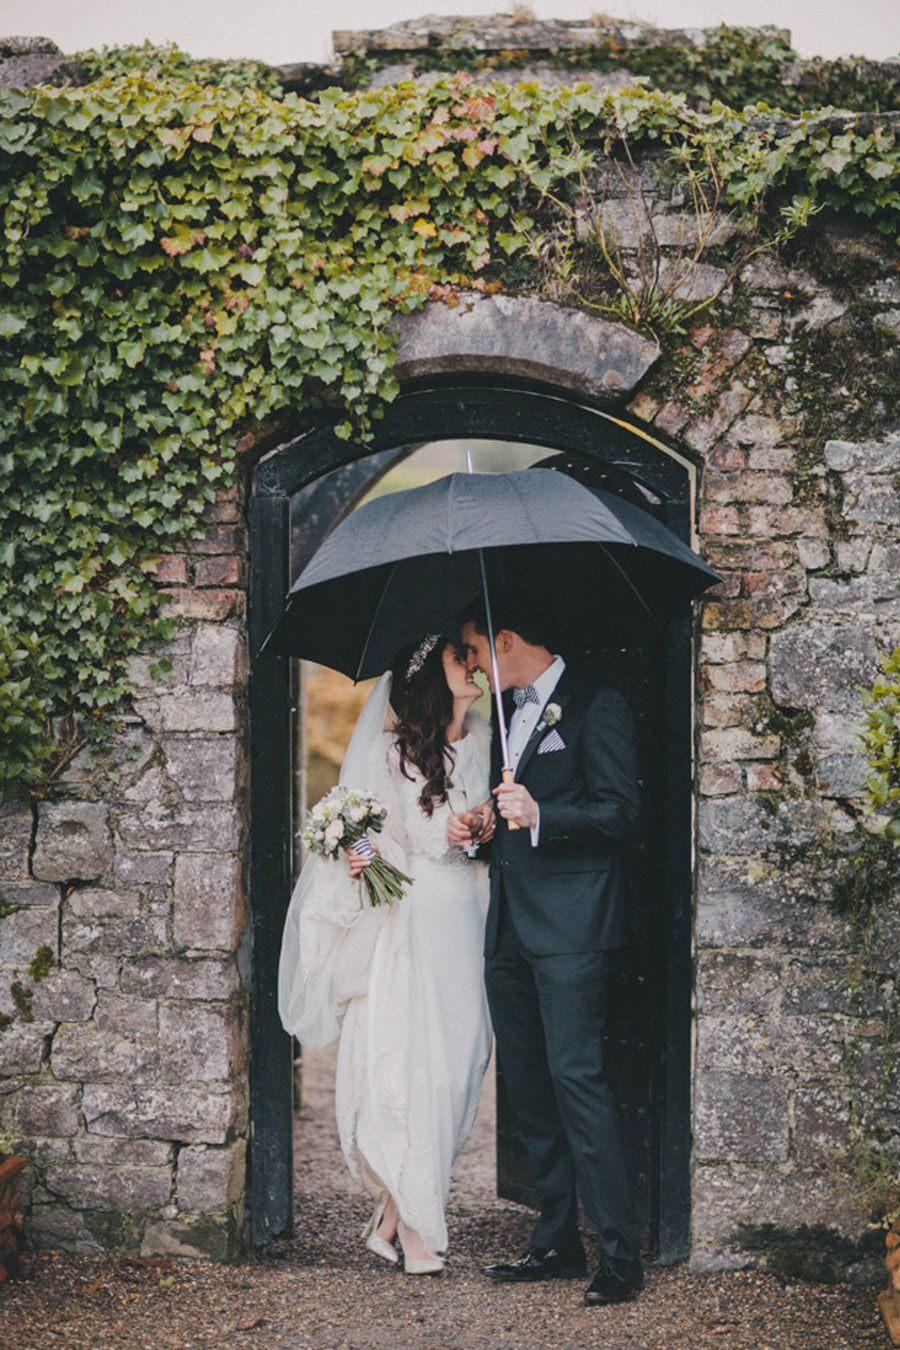 NOVIA MOJADA, NOVIA AFORTUNADA boda-con-lluvia